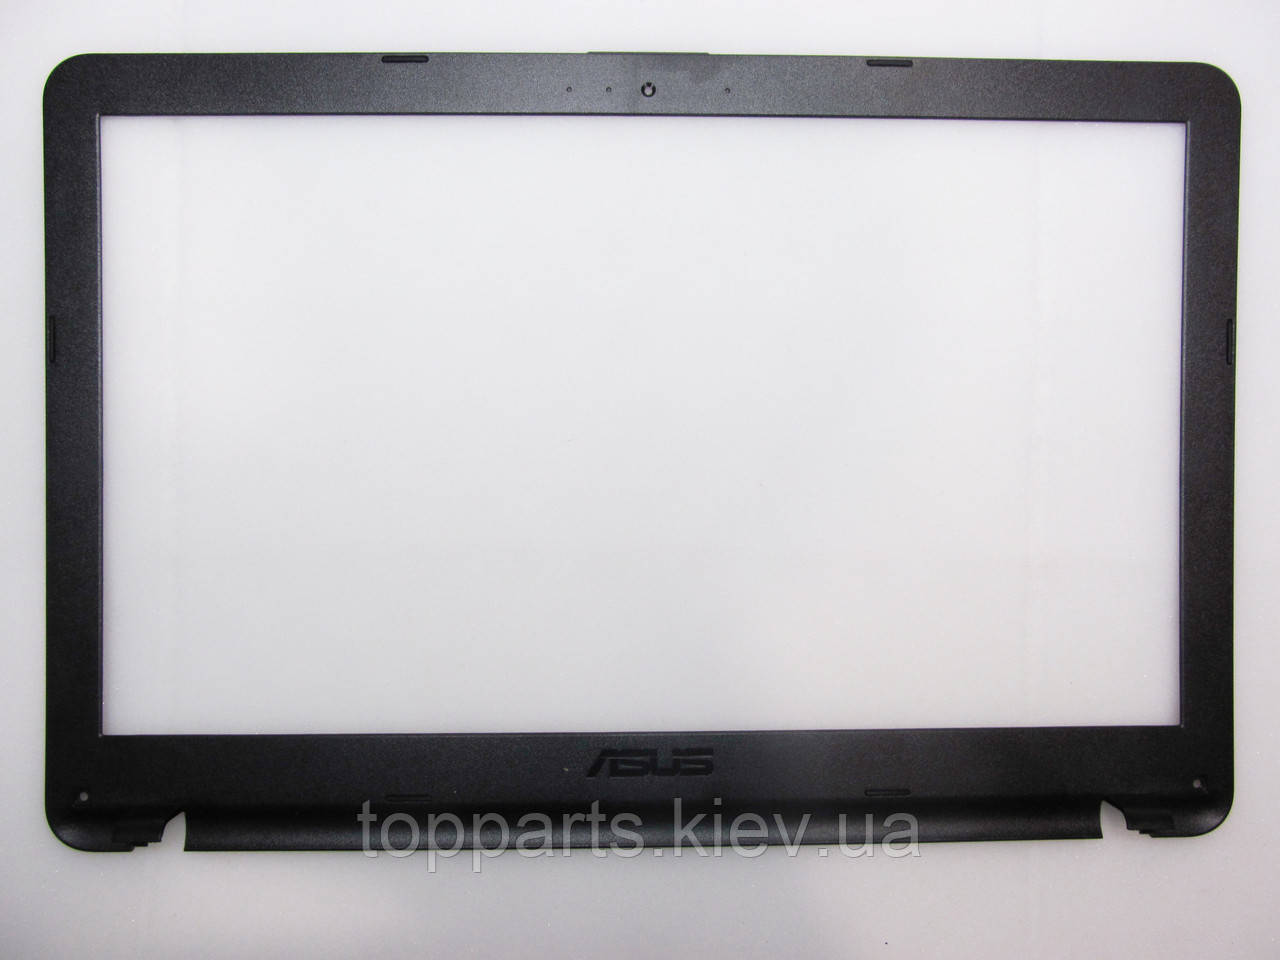 Рамка матрицы (дисплея) для ноутбука Asus X540, X541 13NB0B01AP0811  B